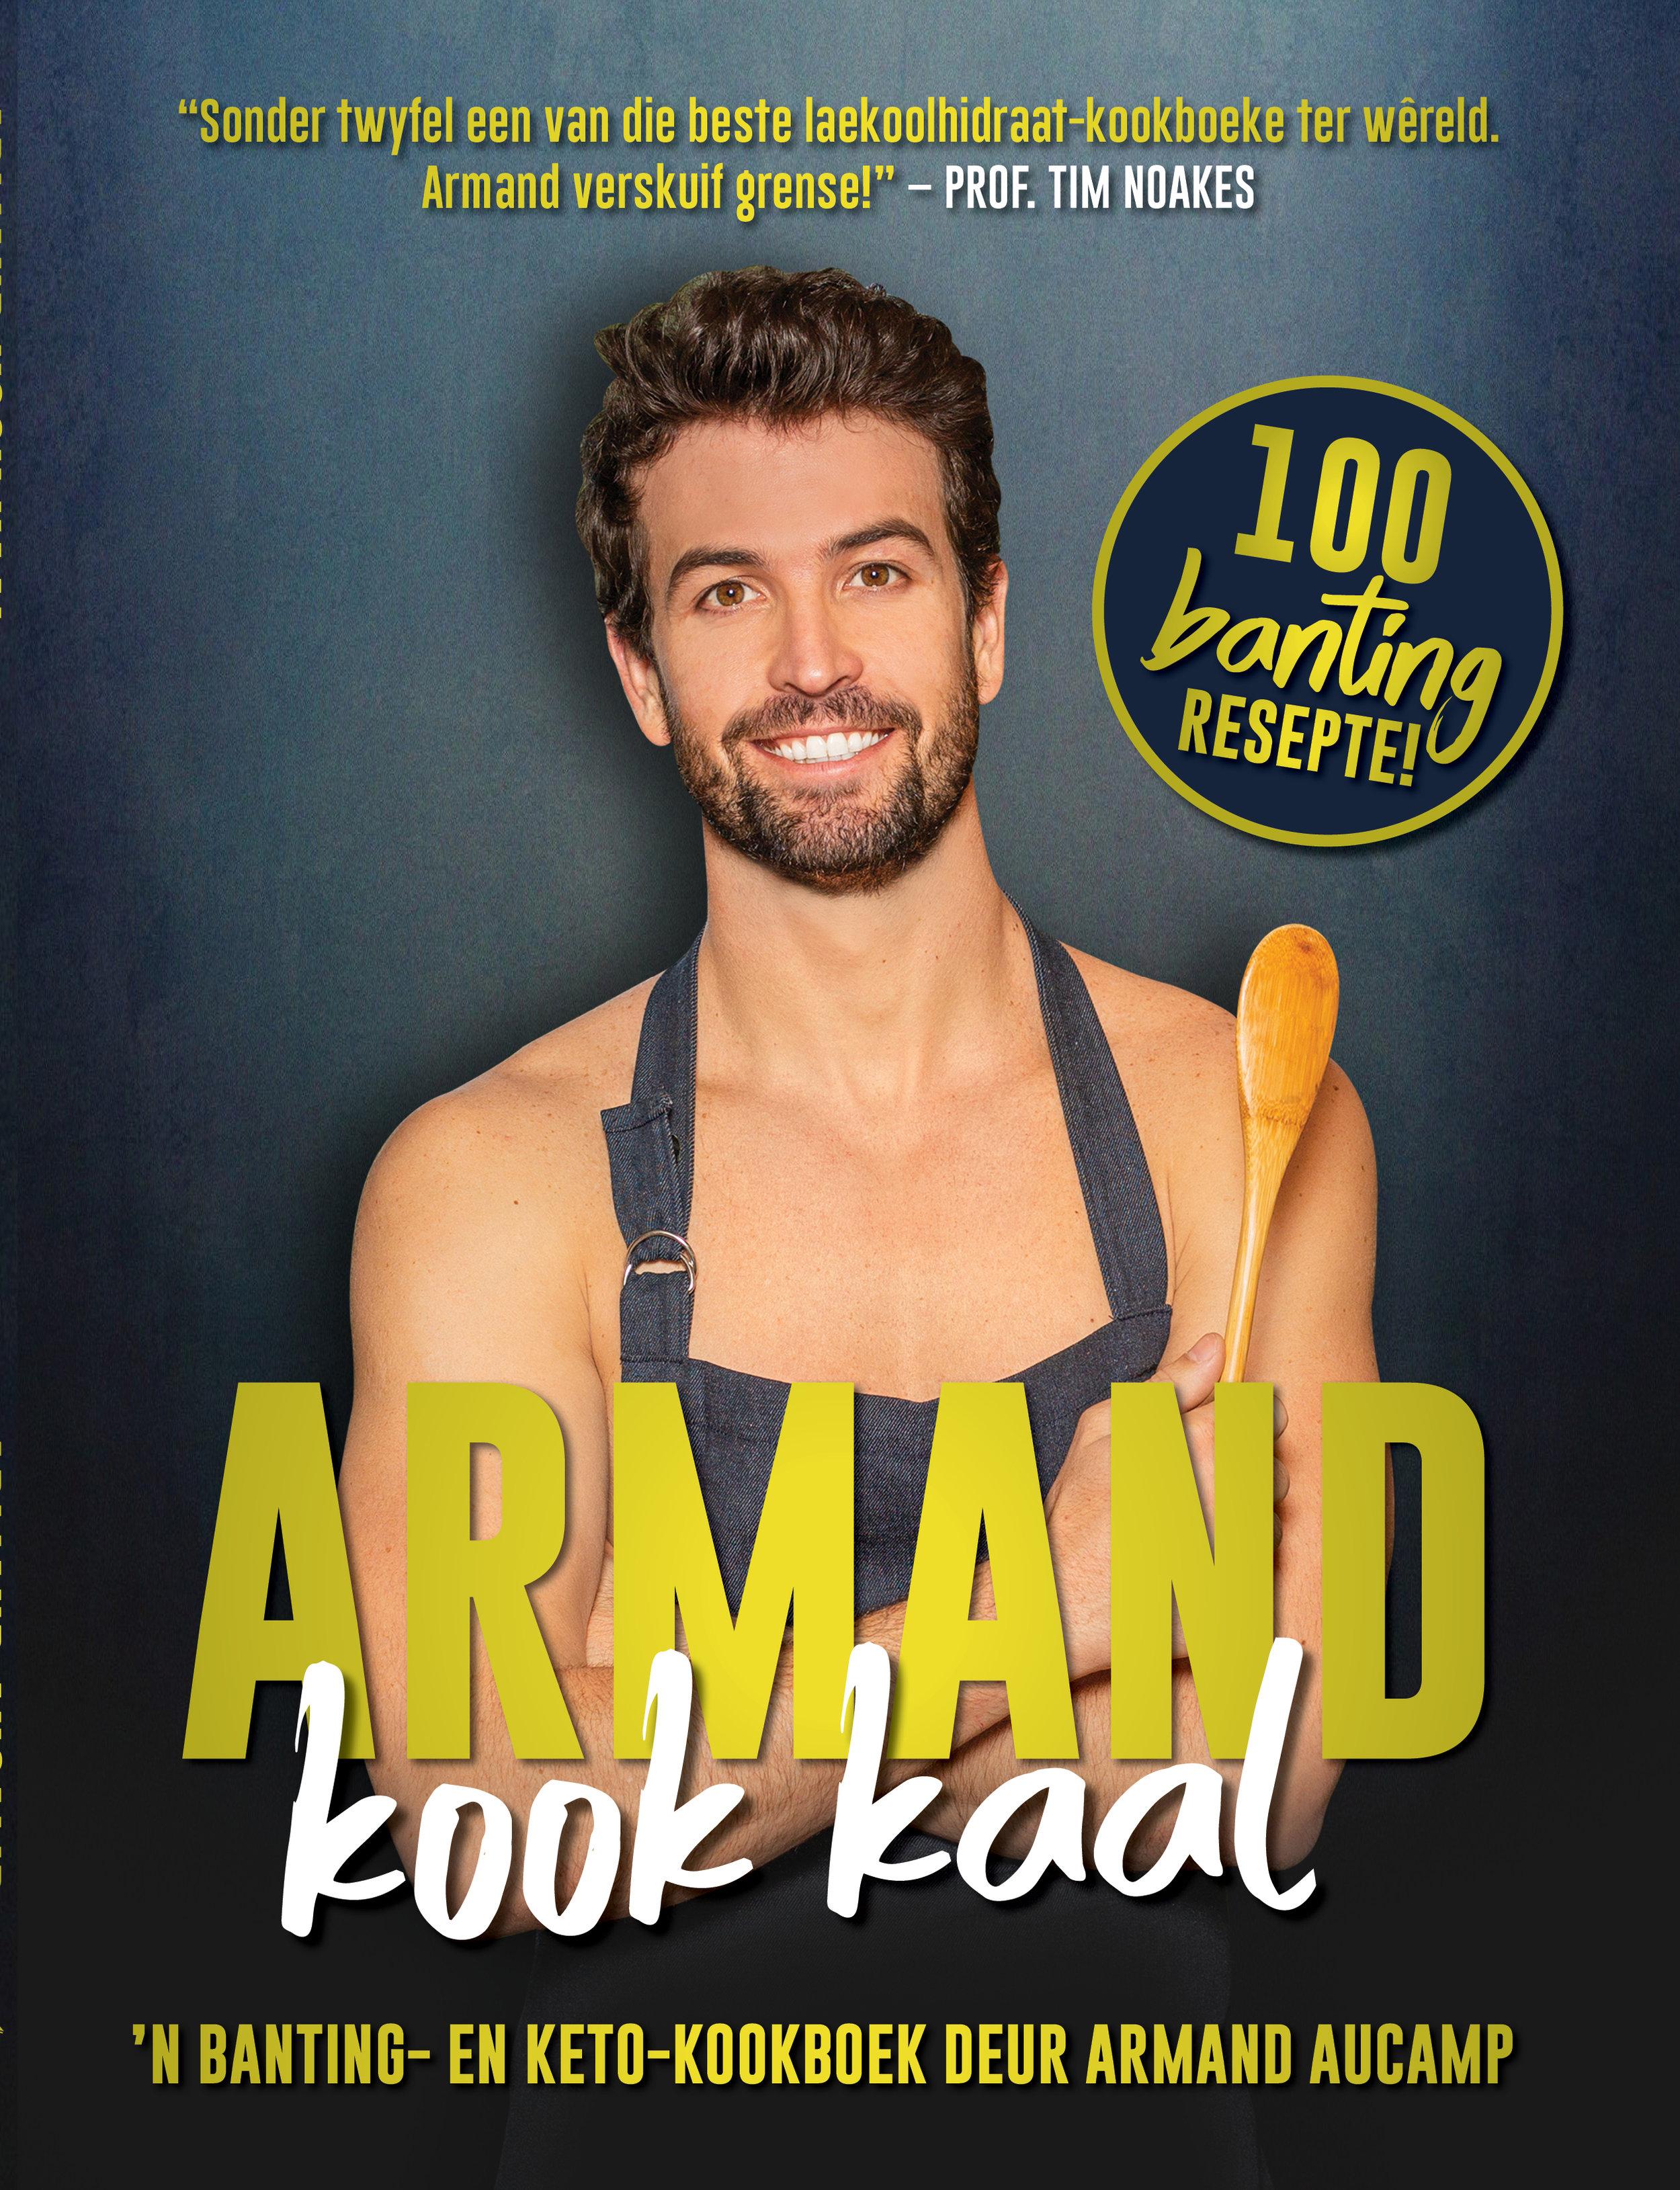 Armand kook kaal.jpg